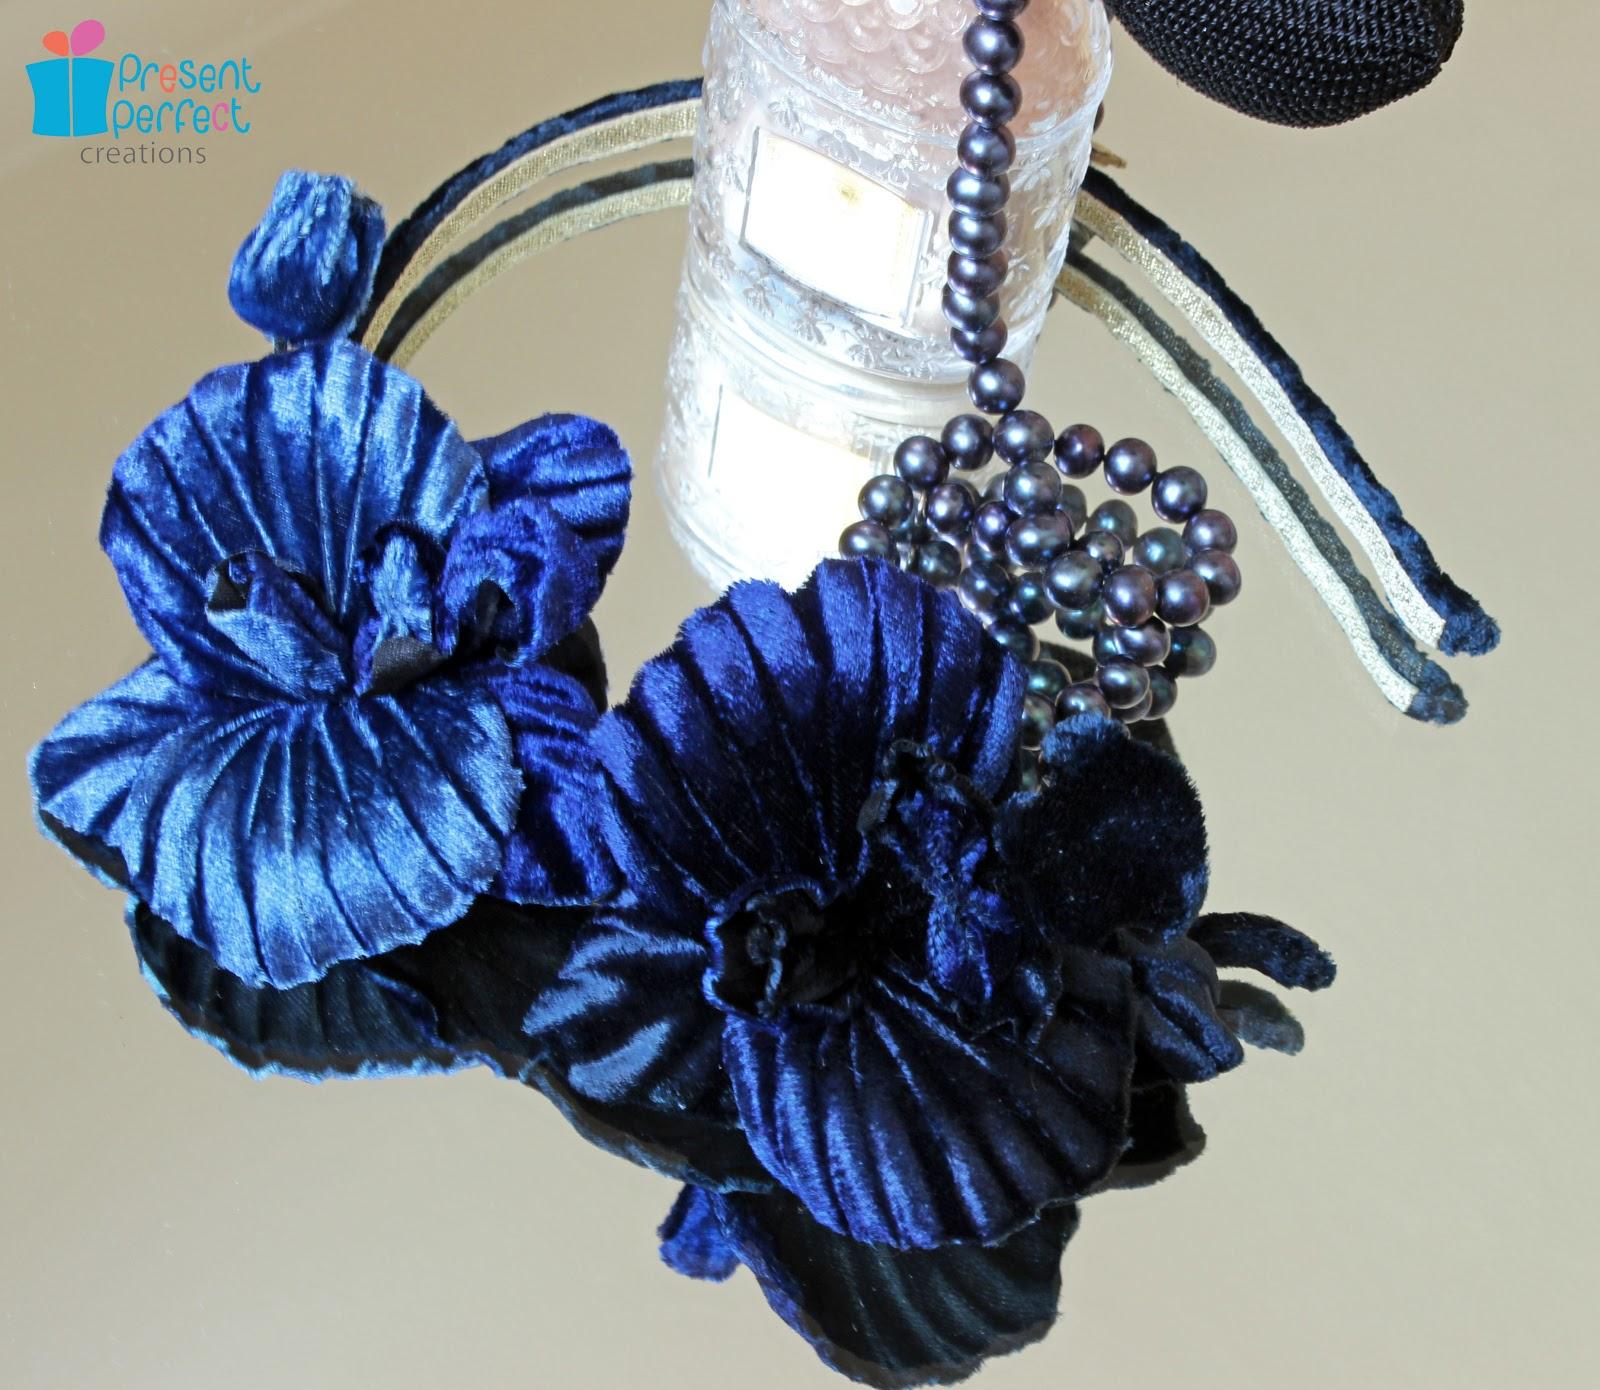 Present Perfect Creations Silk Flower Gallery